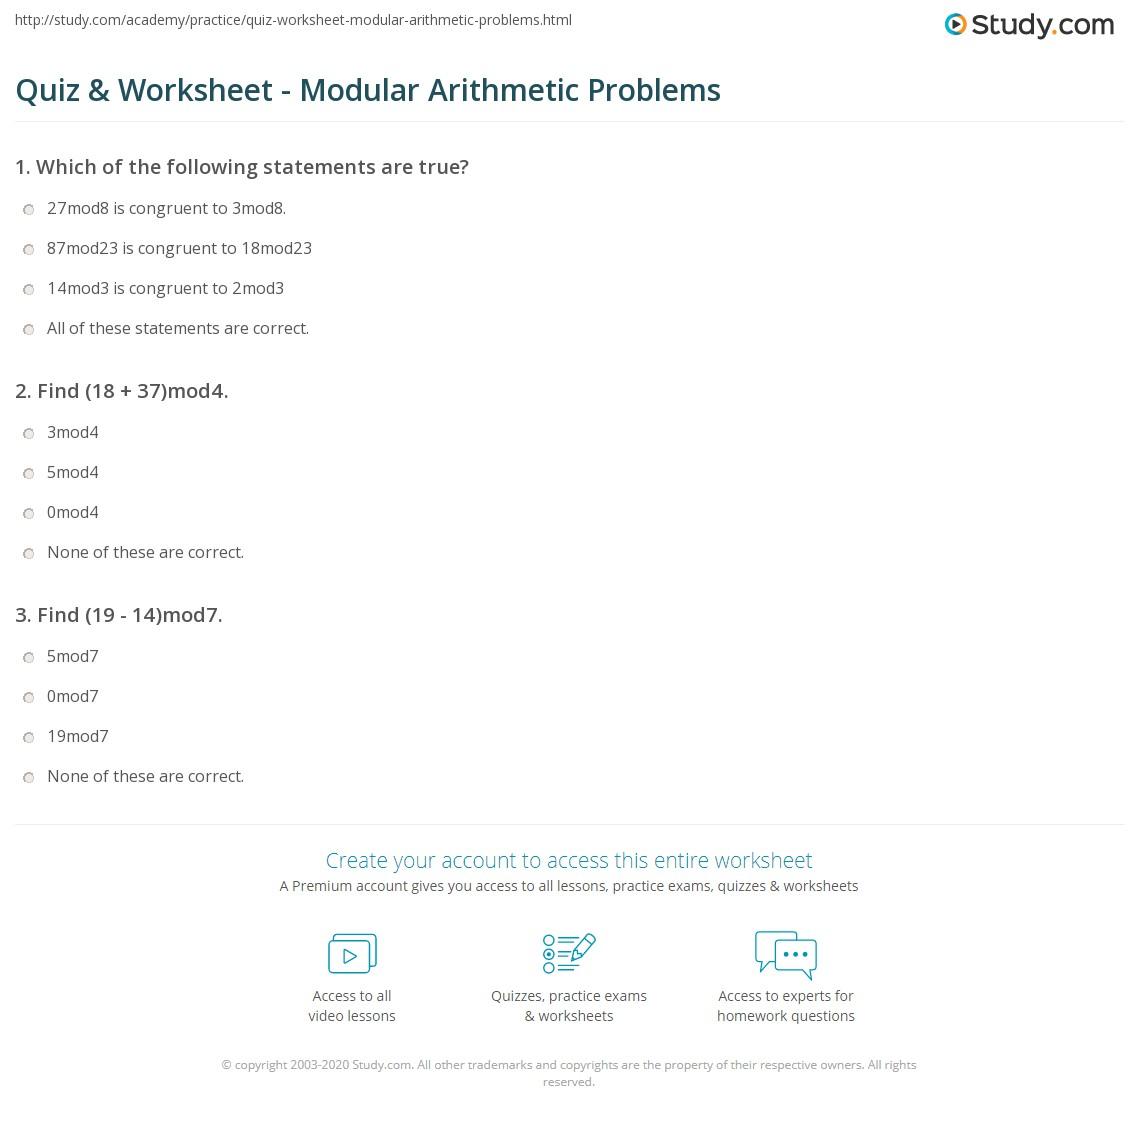 Quiz & Worksheet - Modular Arithmetic Problems   Study.com